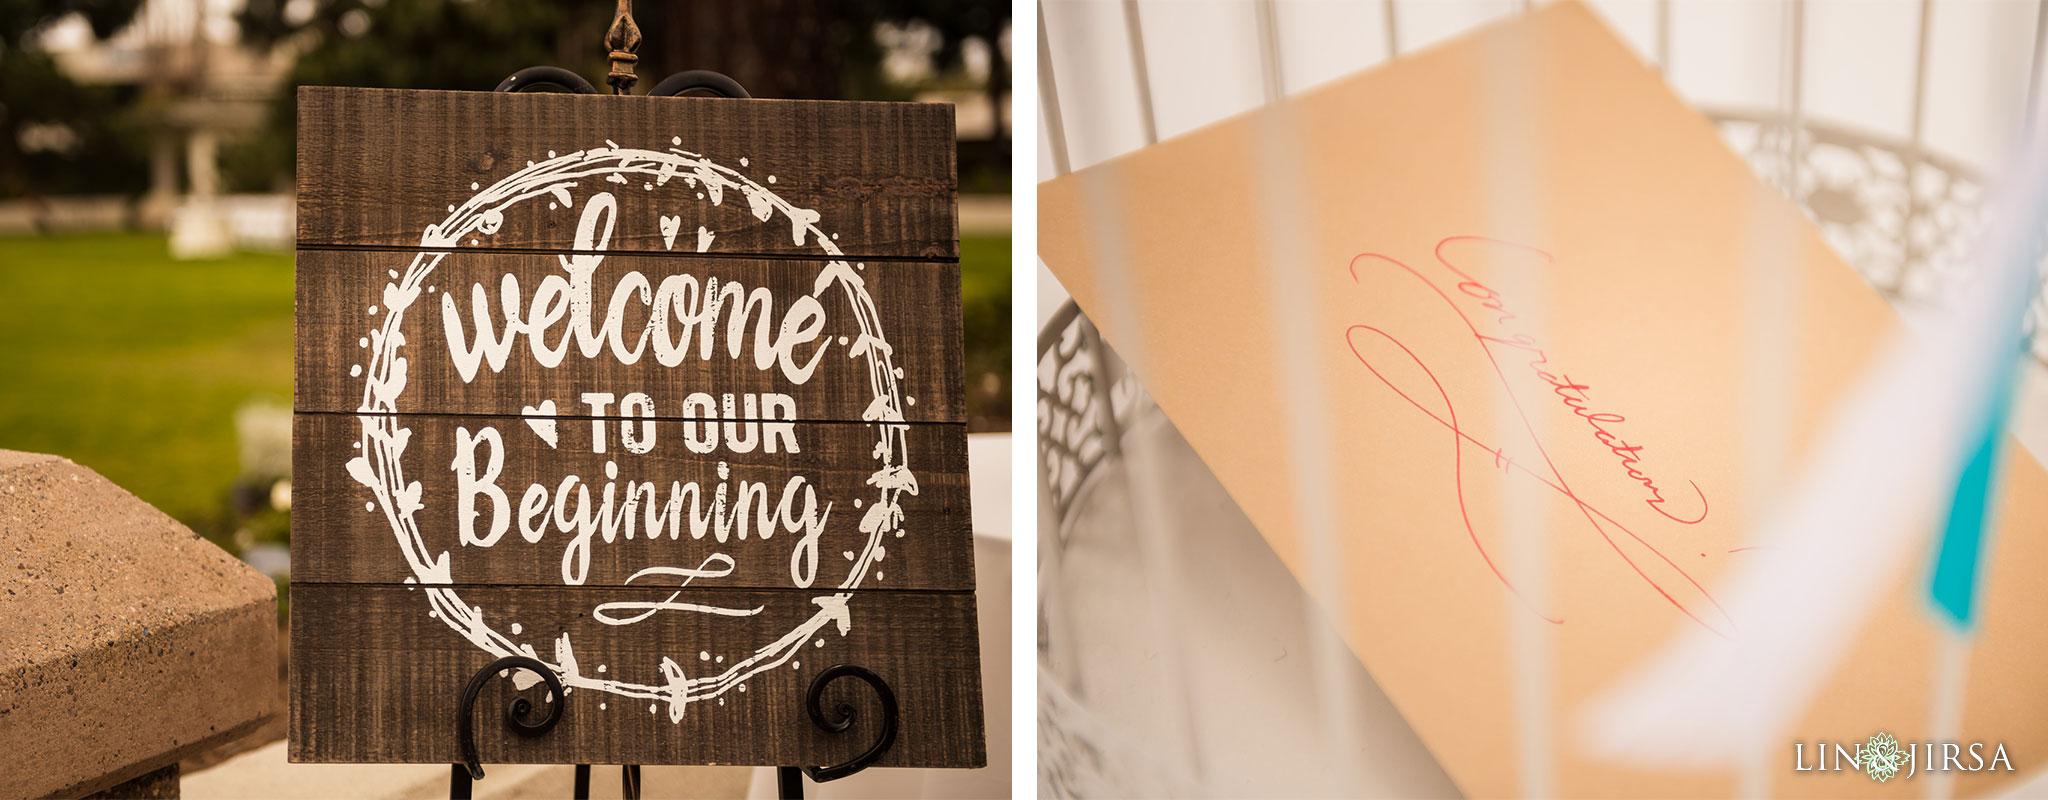 17 turnip rose promenade orange county wedding ceremony photography